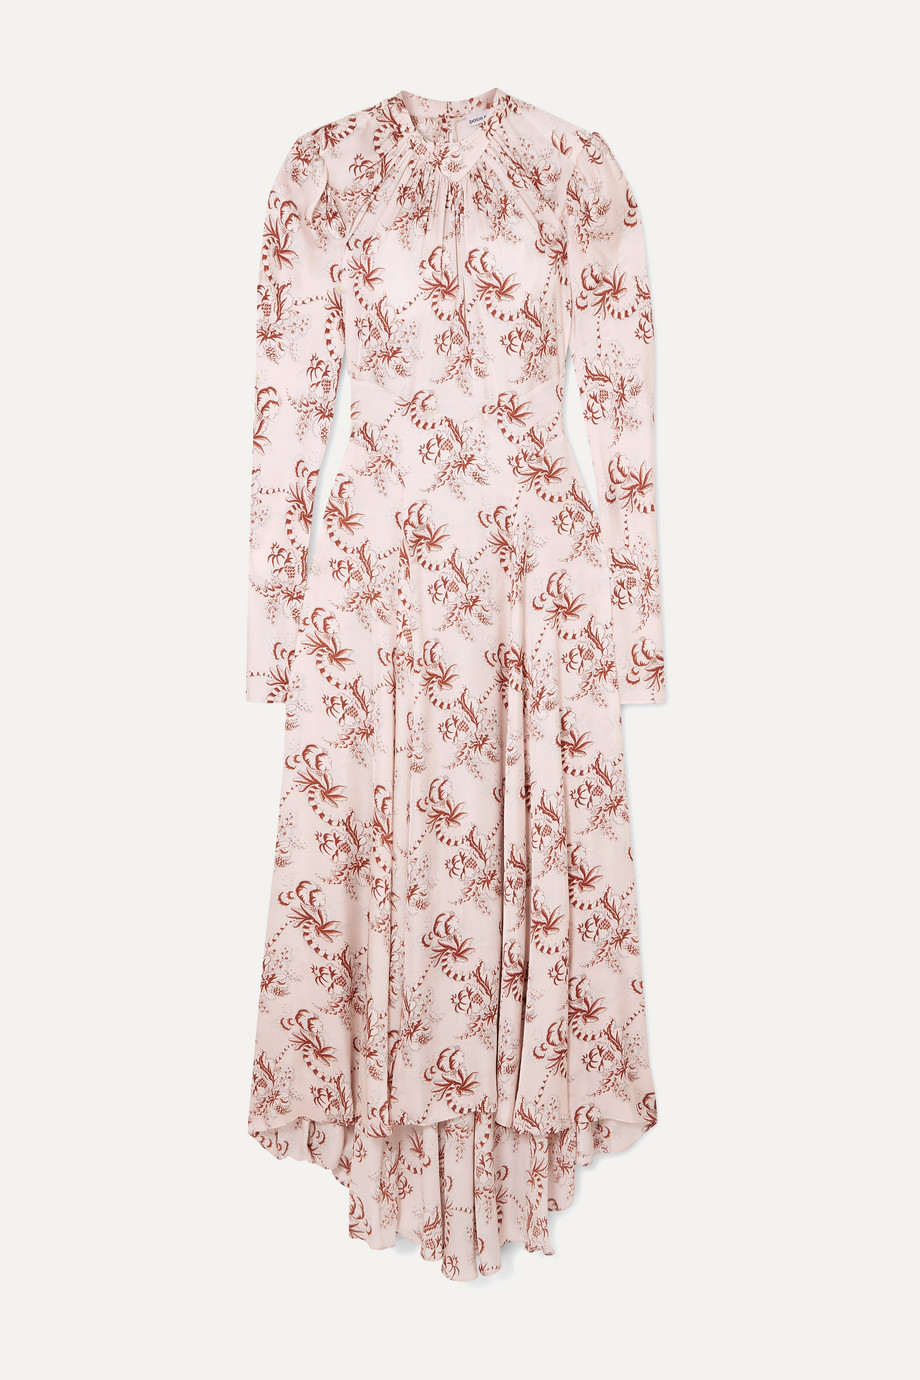 Paco Rabanne | Floral-print satin midi dress | NET-A-PORTER.COM